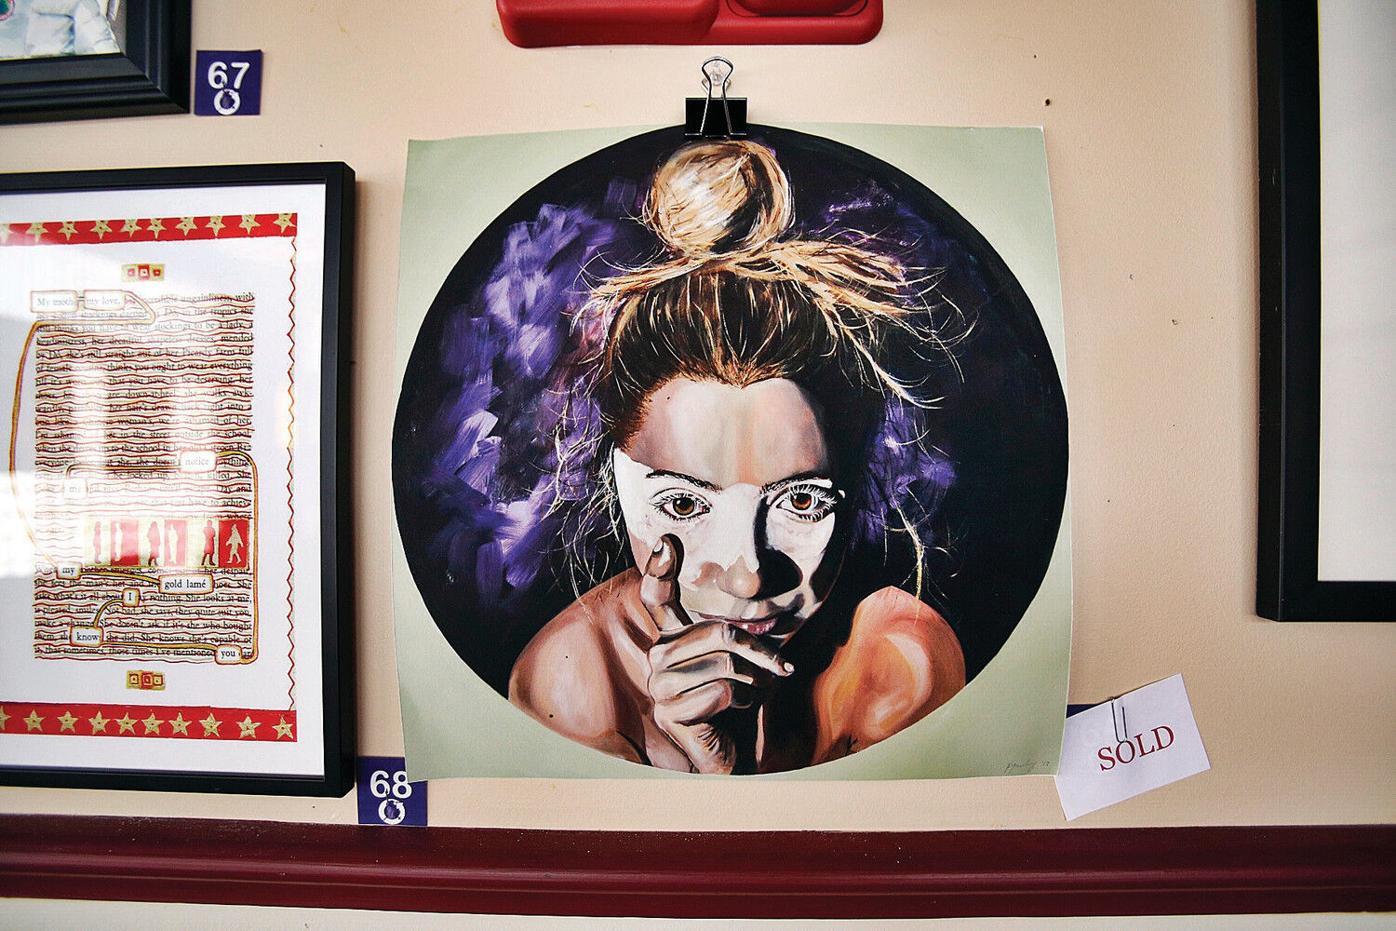 #PressforProgress art exhibit: A peaceful, yet powerful, art movement